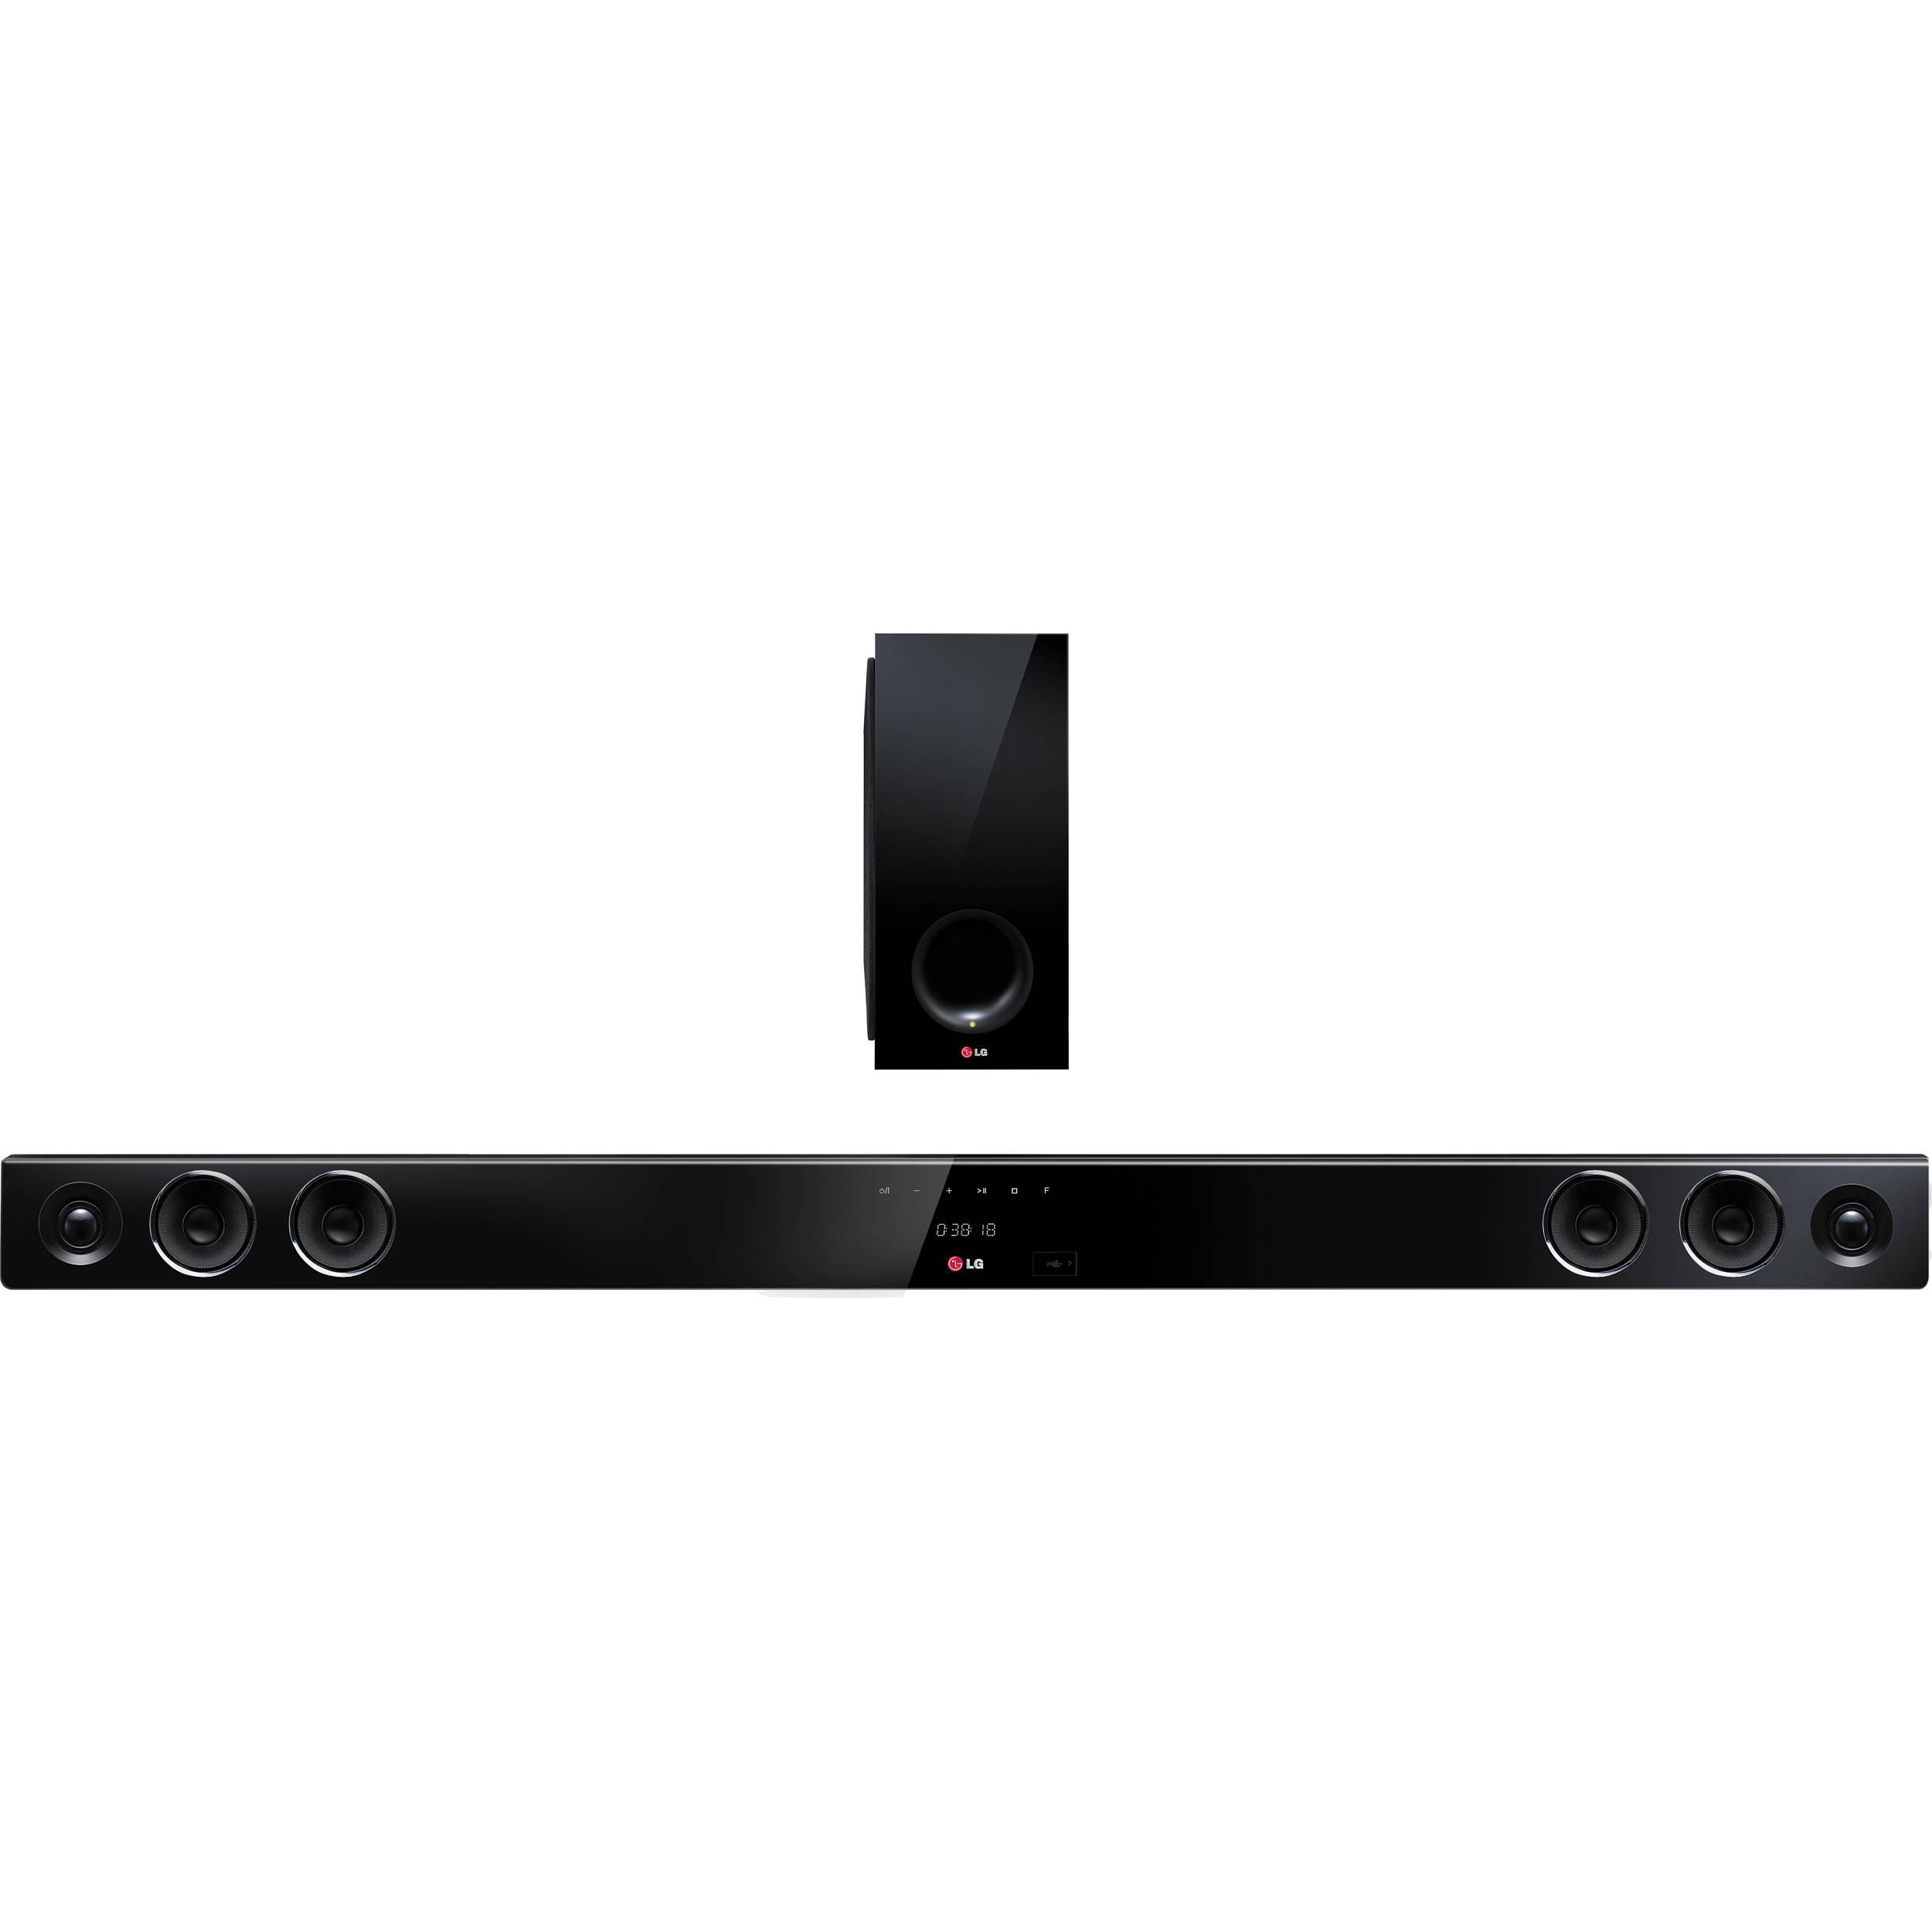 lg sound bar nb3730a manual